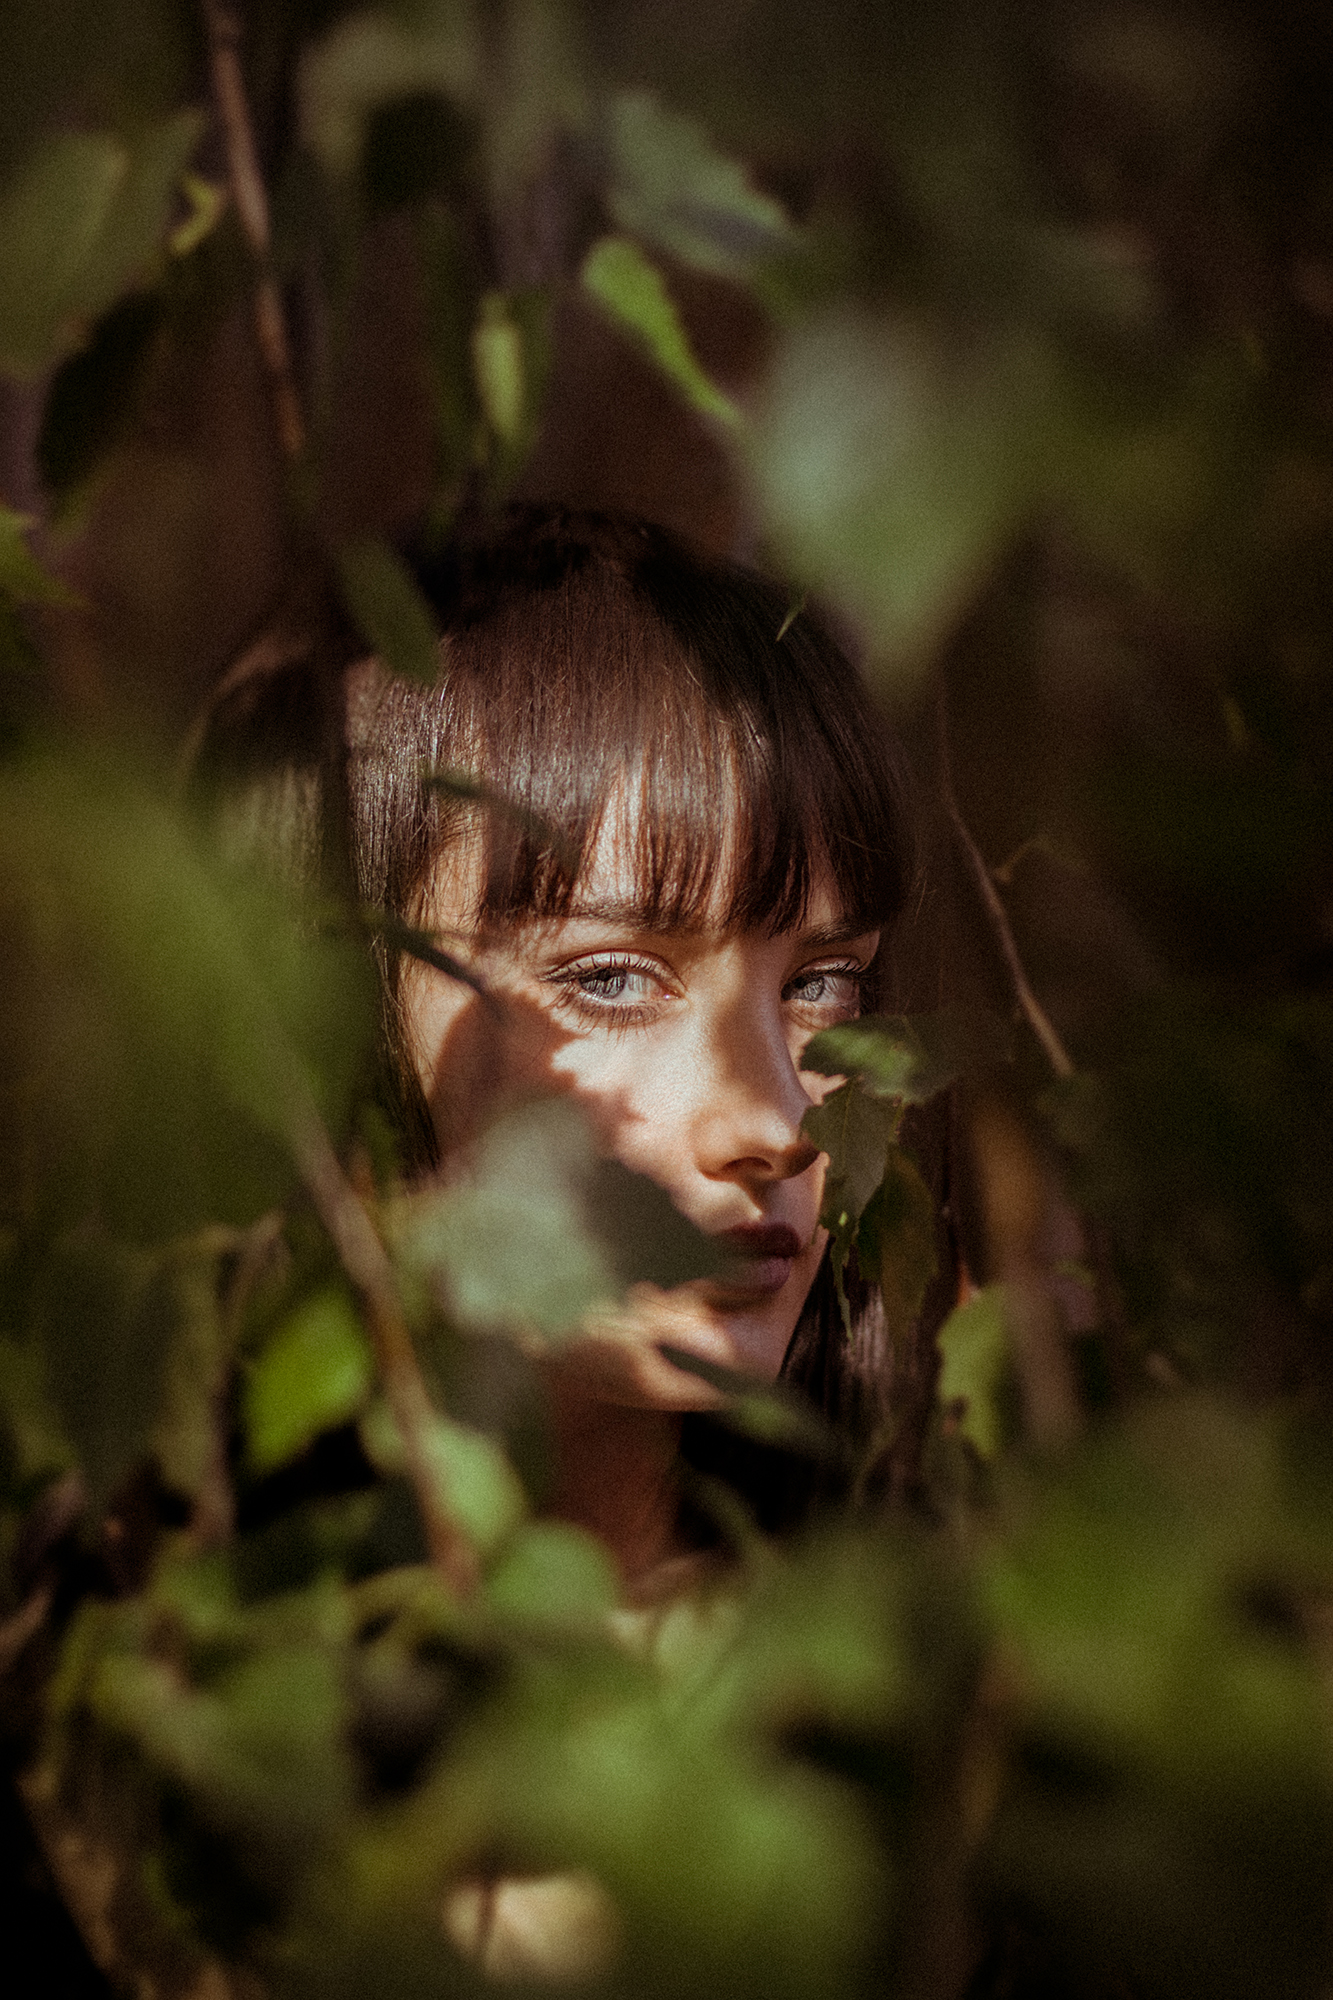 Mila-Nowhere-Andrea-Passon-7